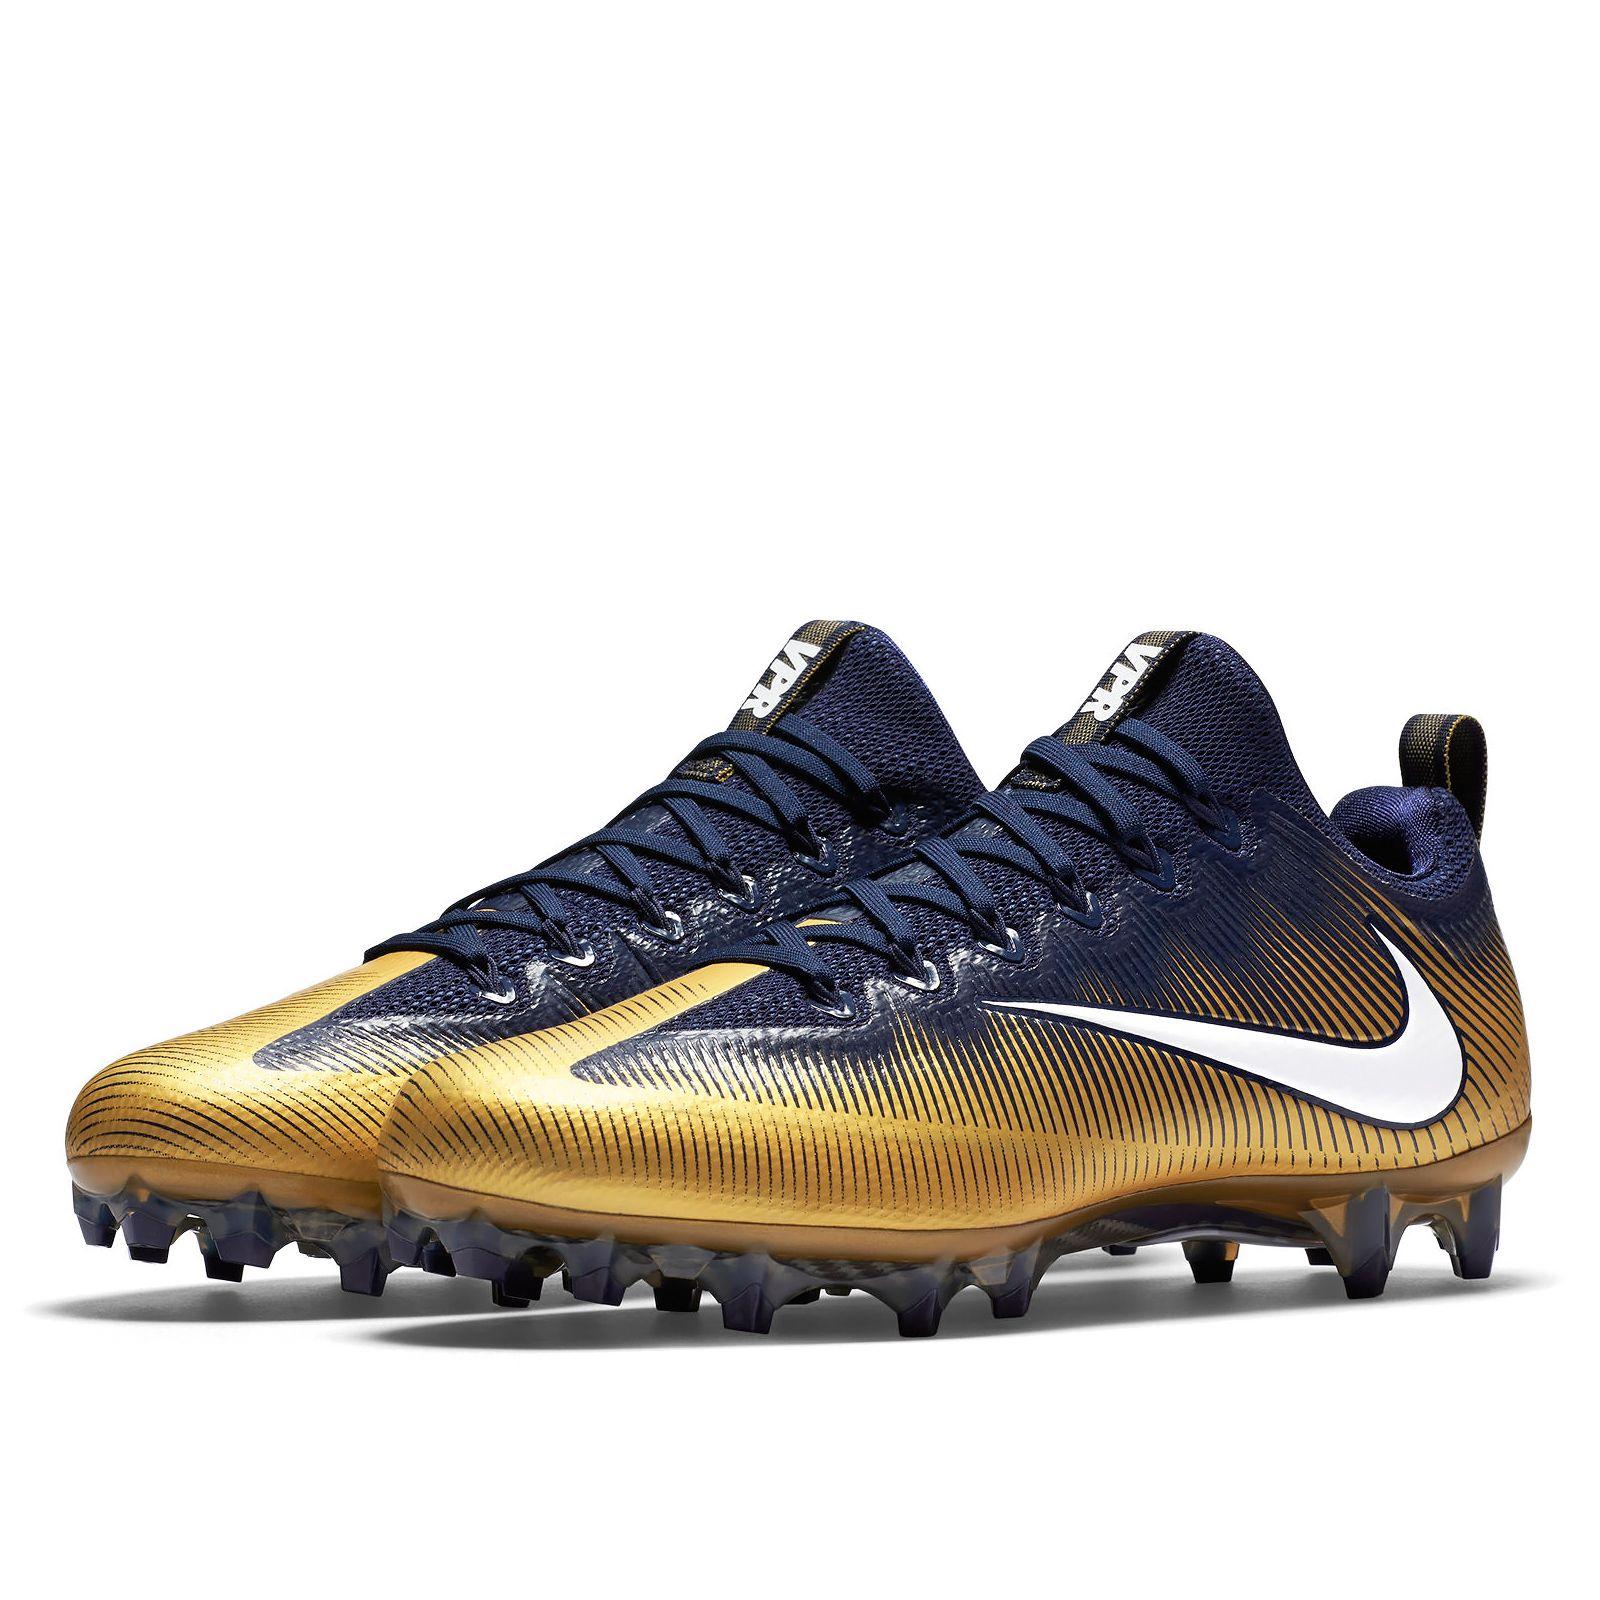 1e8c592e8 Brand New Nike Vapor Untouchable Pro TD Football Cleats On Sale - Clearance